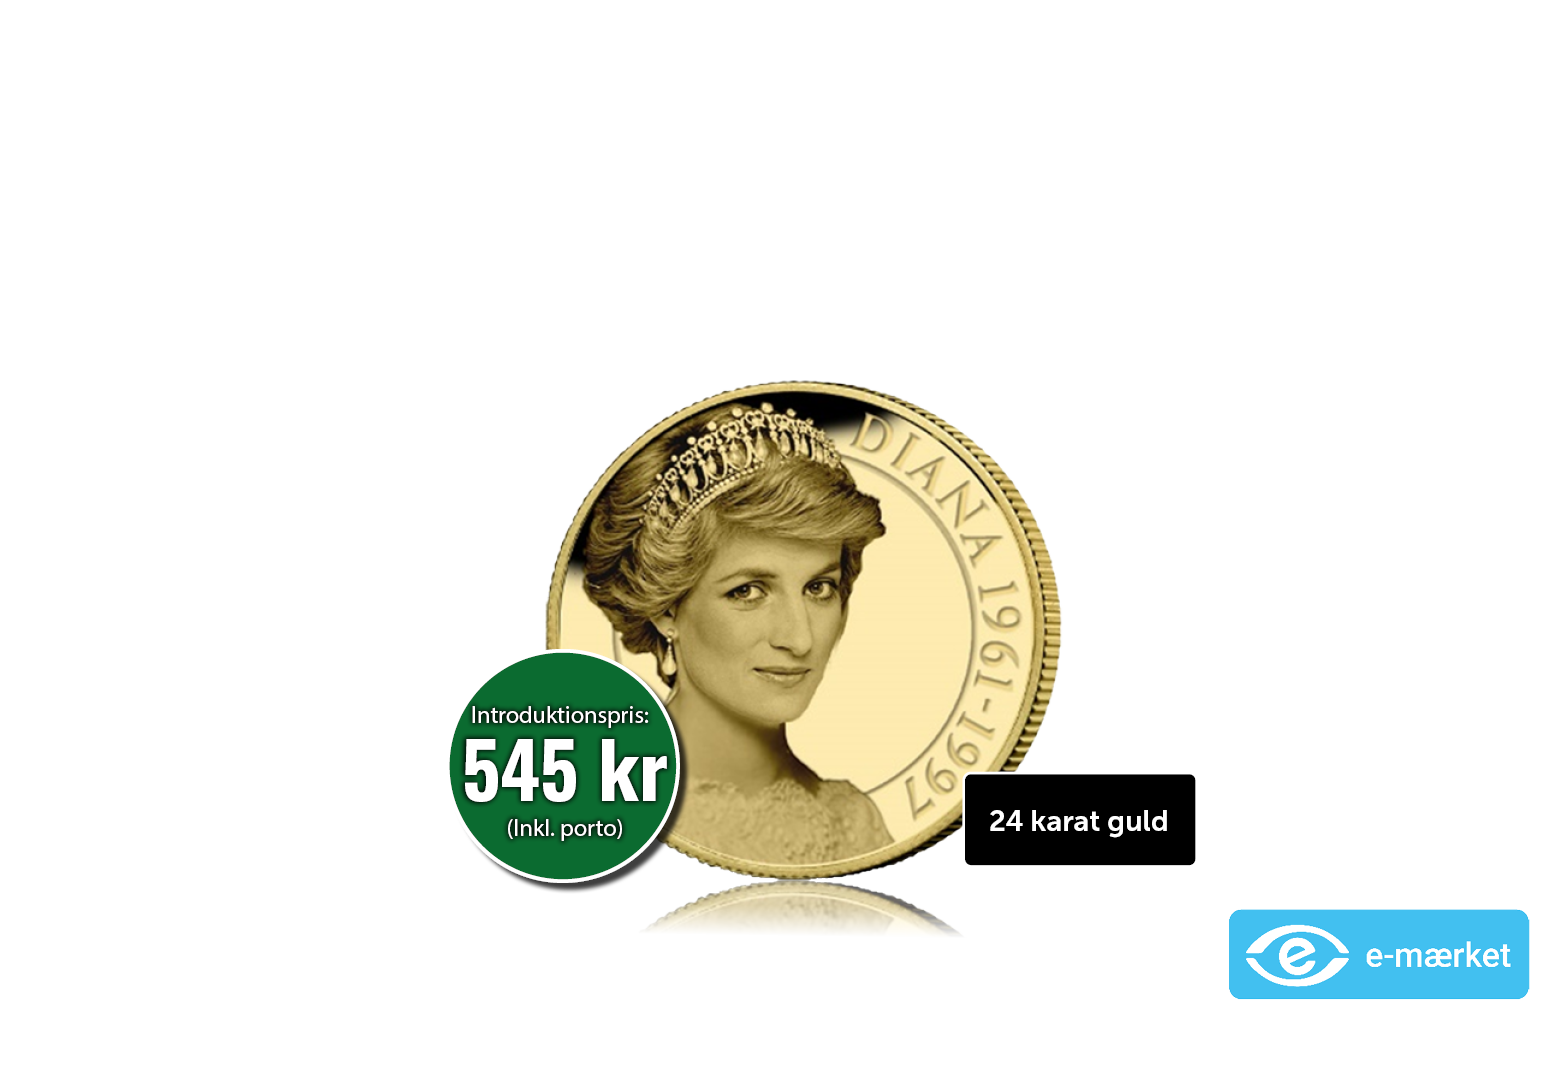 Smuk guldmønt med Prinsesse Diana- Folkets prinsesse